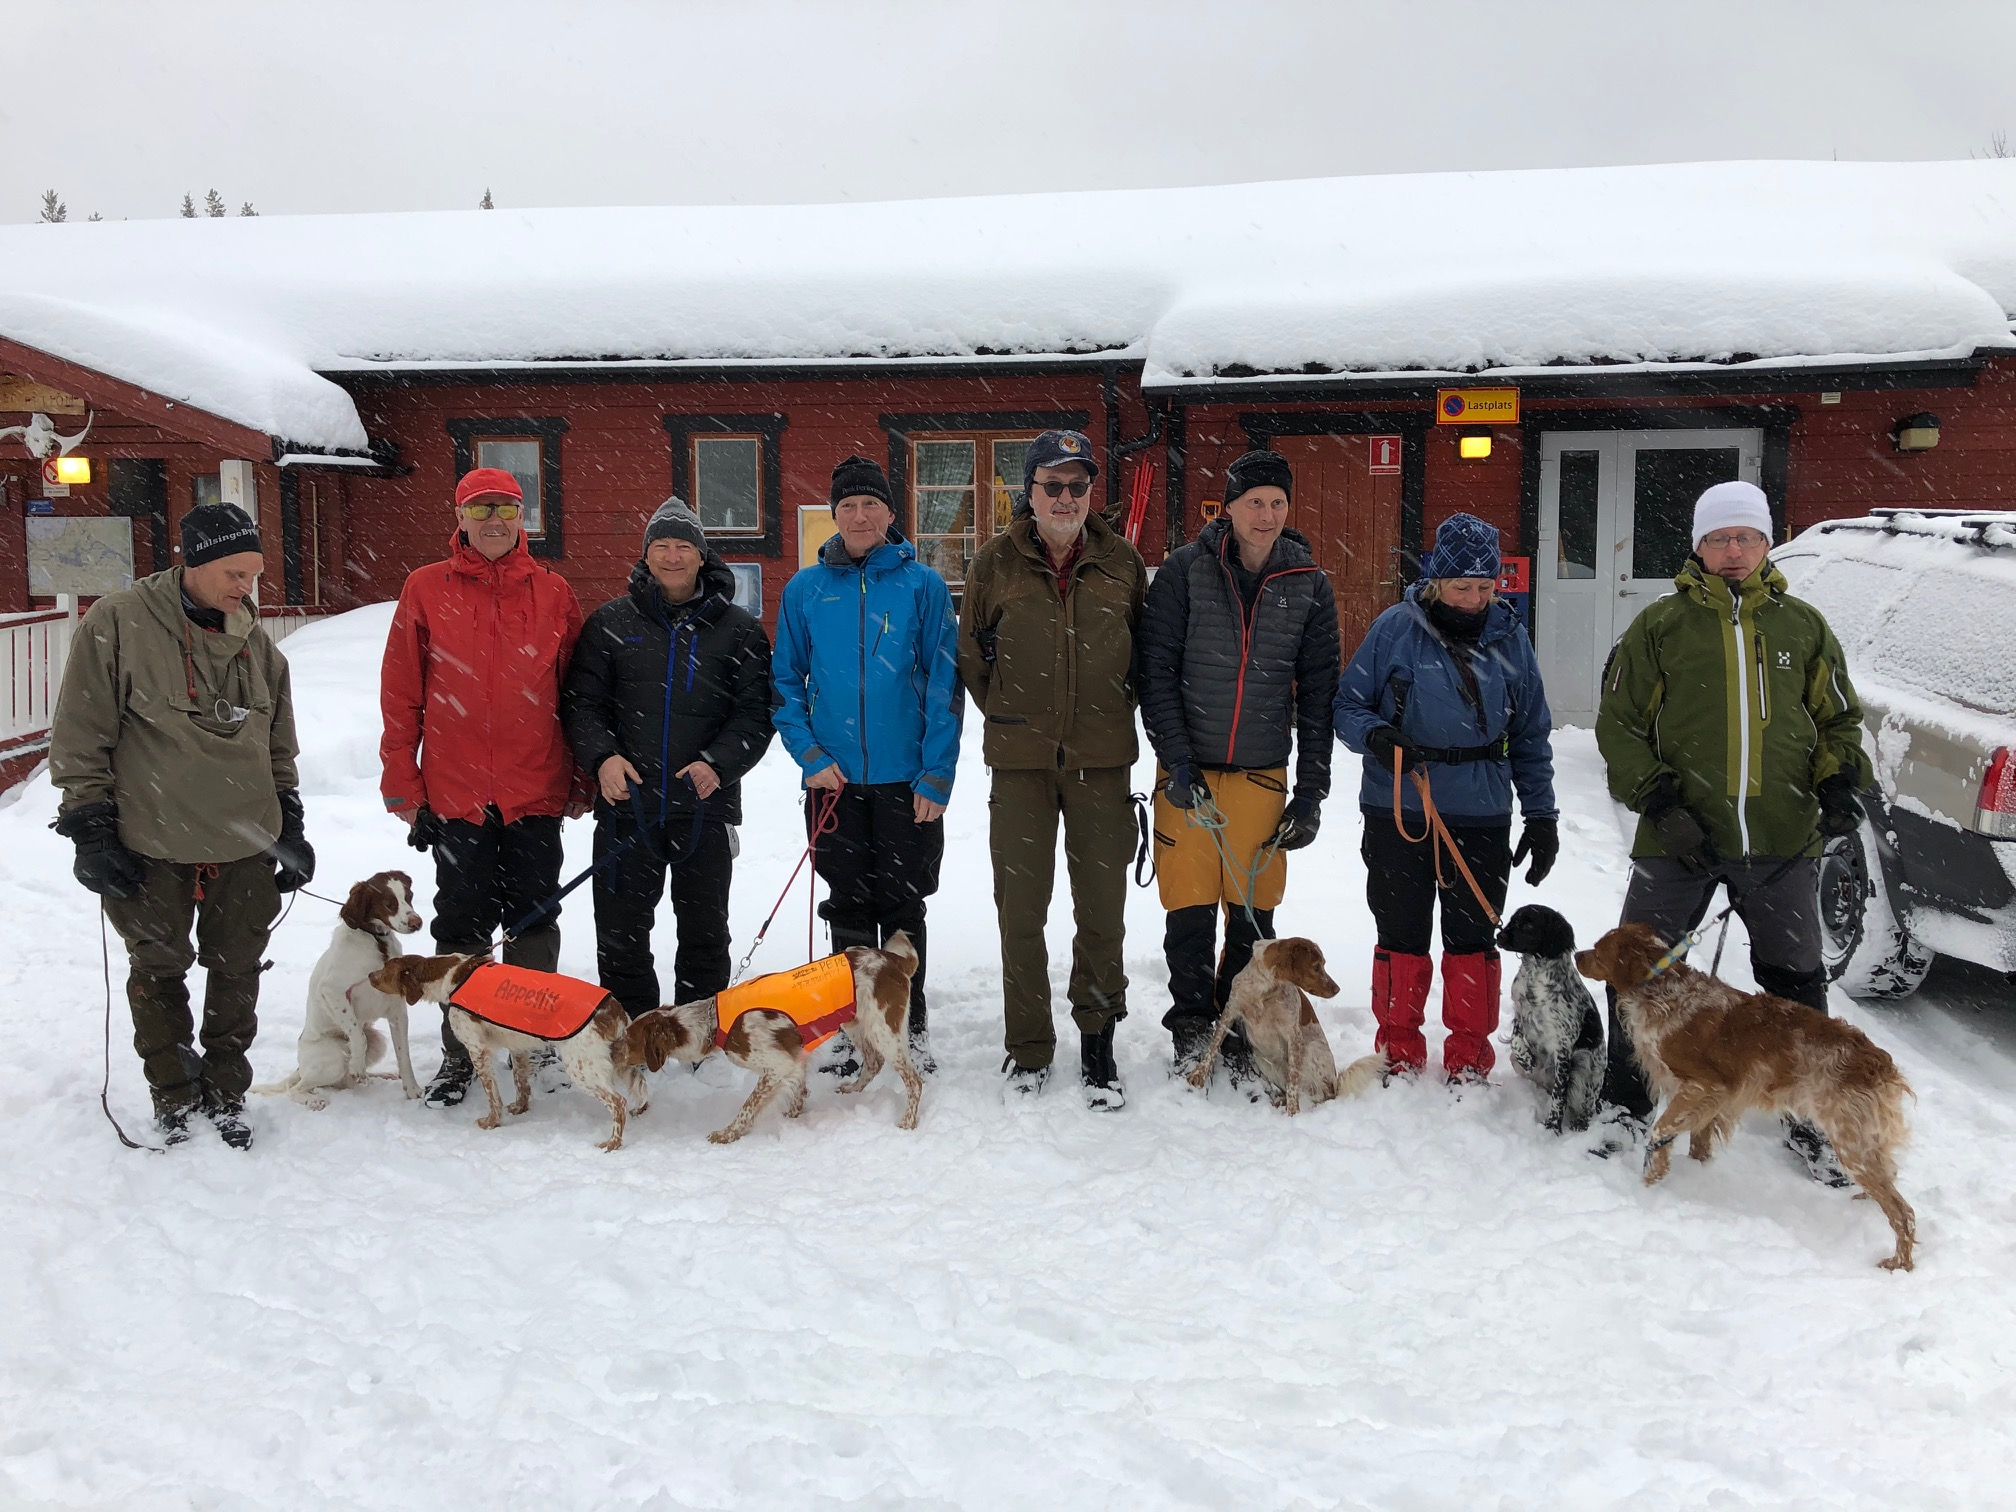 Jaktprov Tossåsen/Mittådalen 7-8 Mars 2020